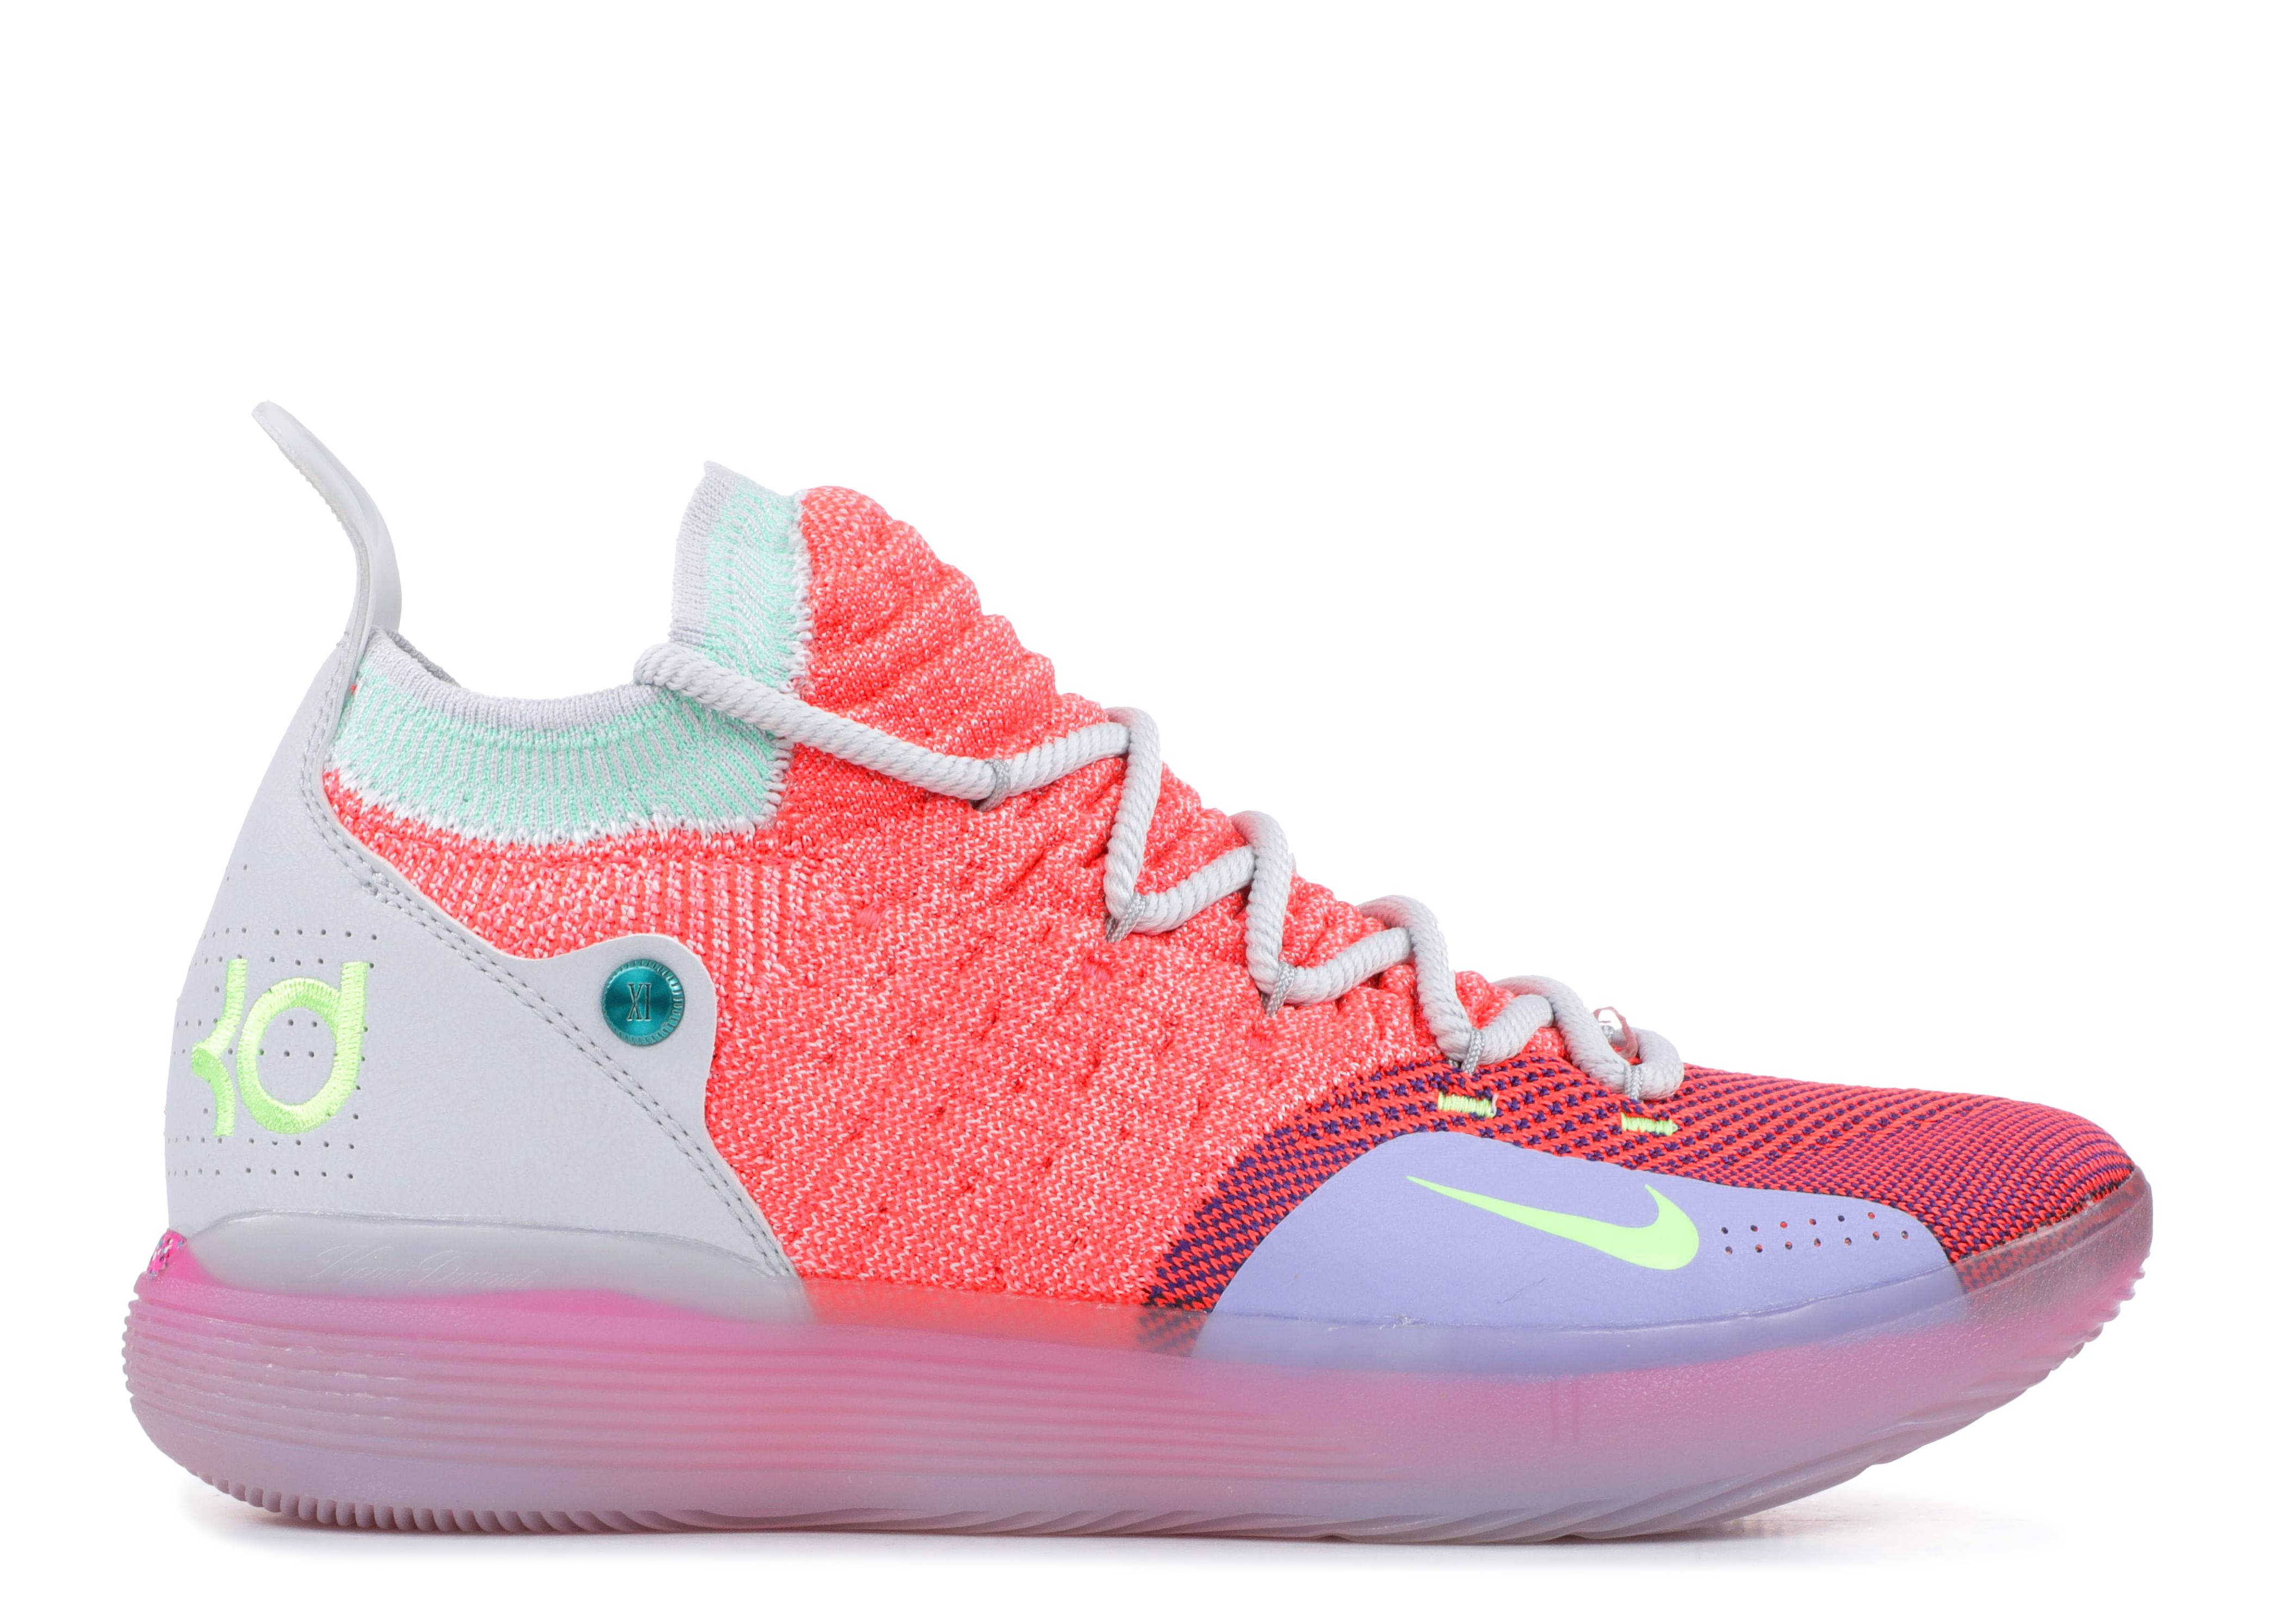 16b9c0cdbdba7 Nike Zoom Kd11